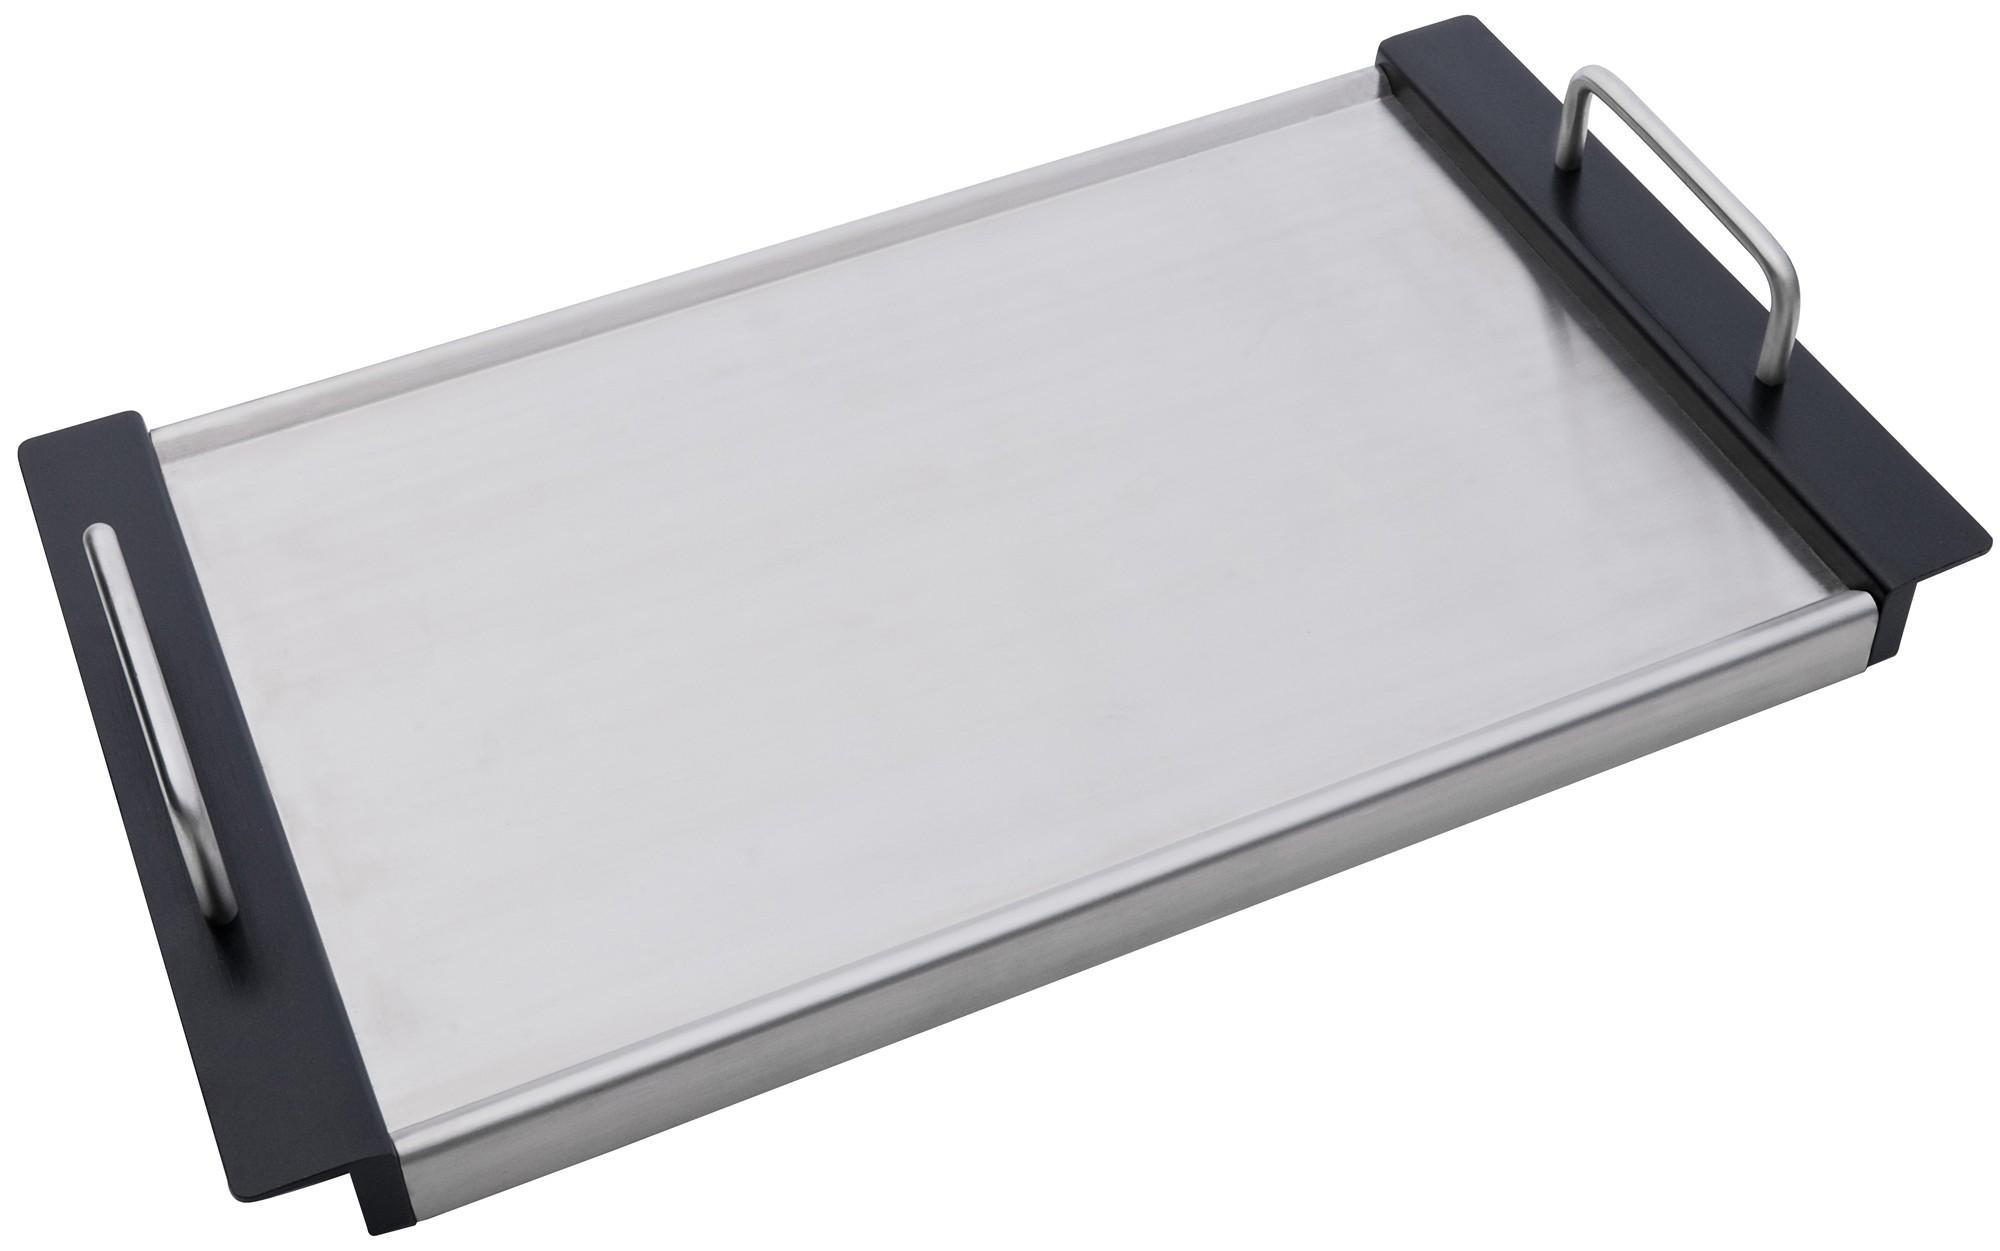 CADAC Teppanyaki Platte 26,5 x 46,4cm Edelstahl Bild 1